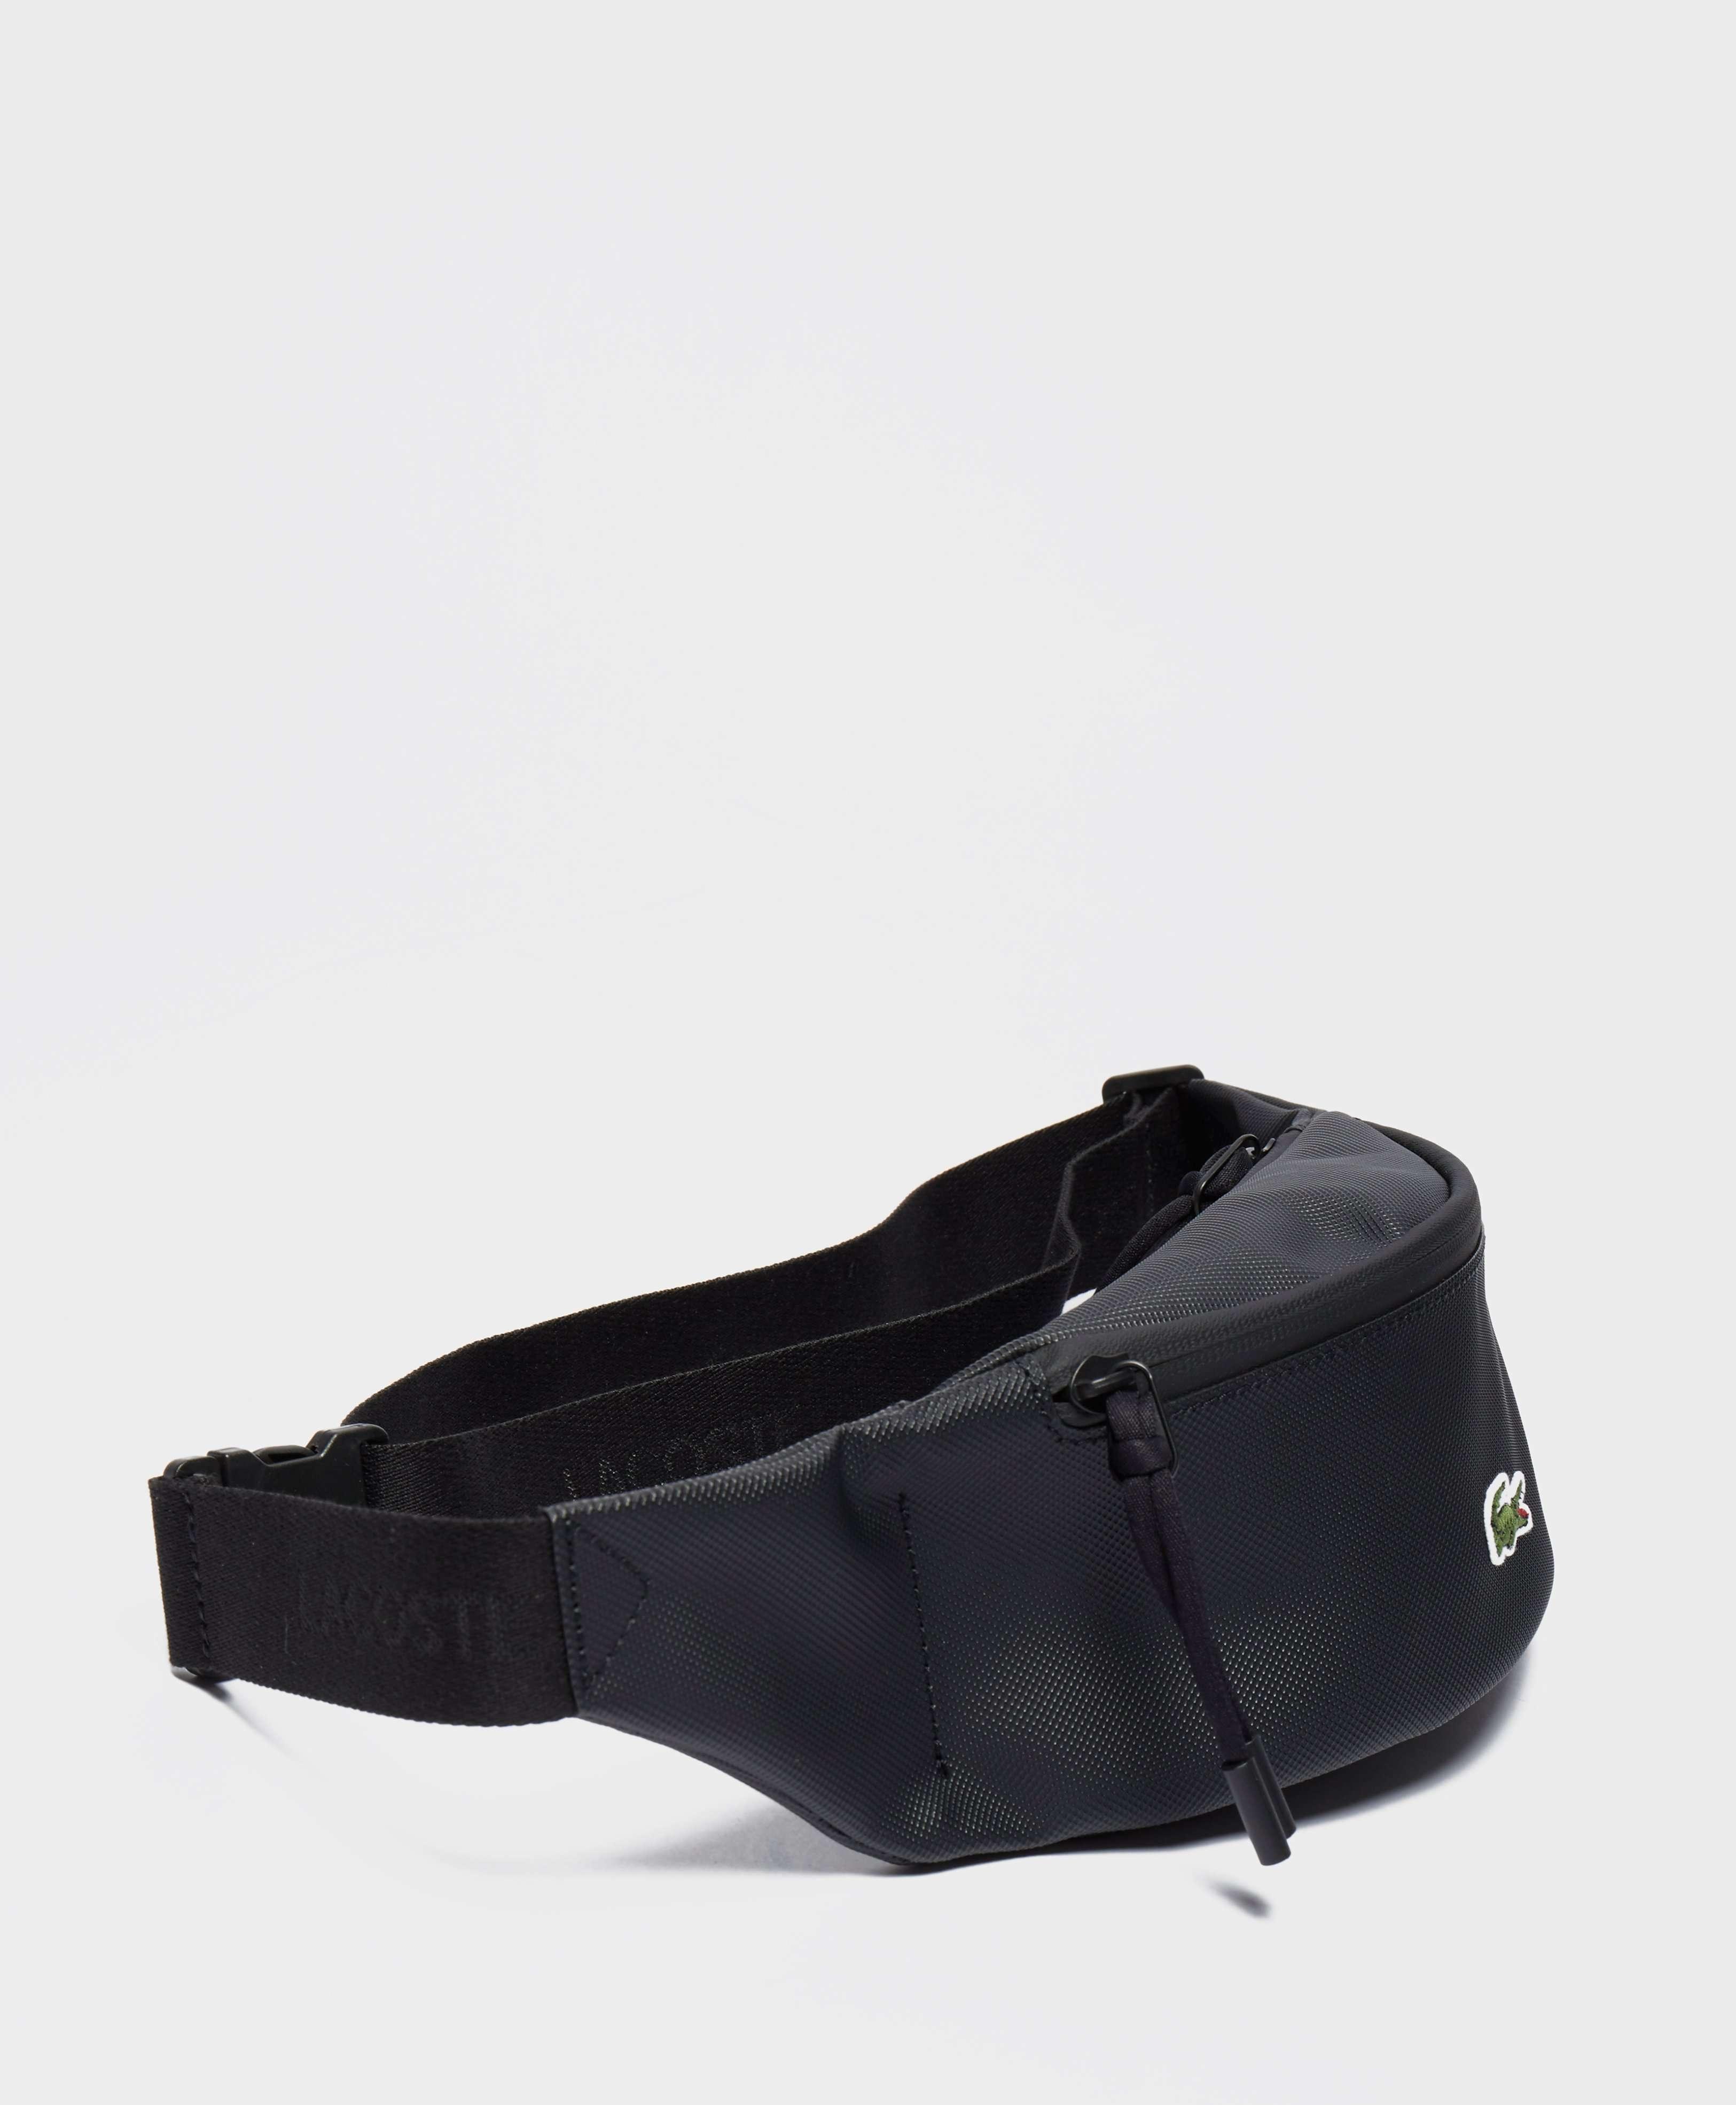 Lacoste Croc Bum Bag - Online Exclusive